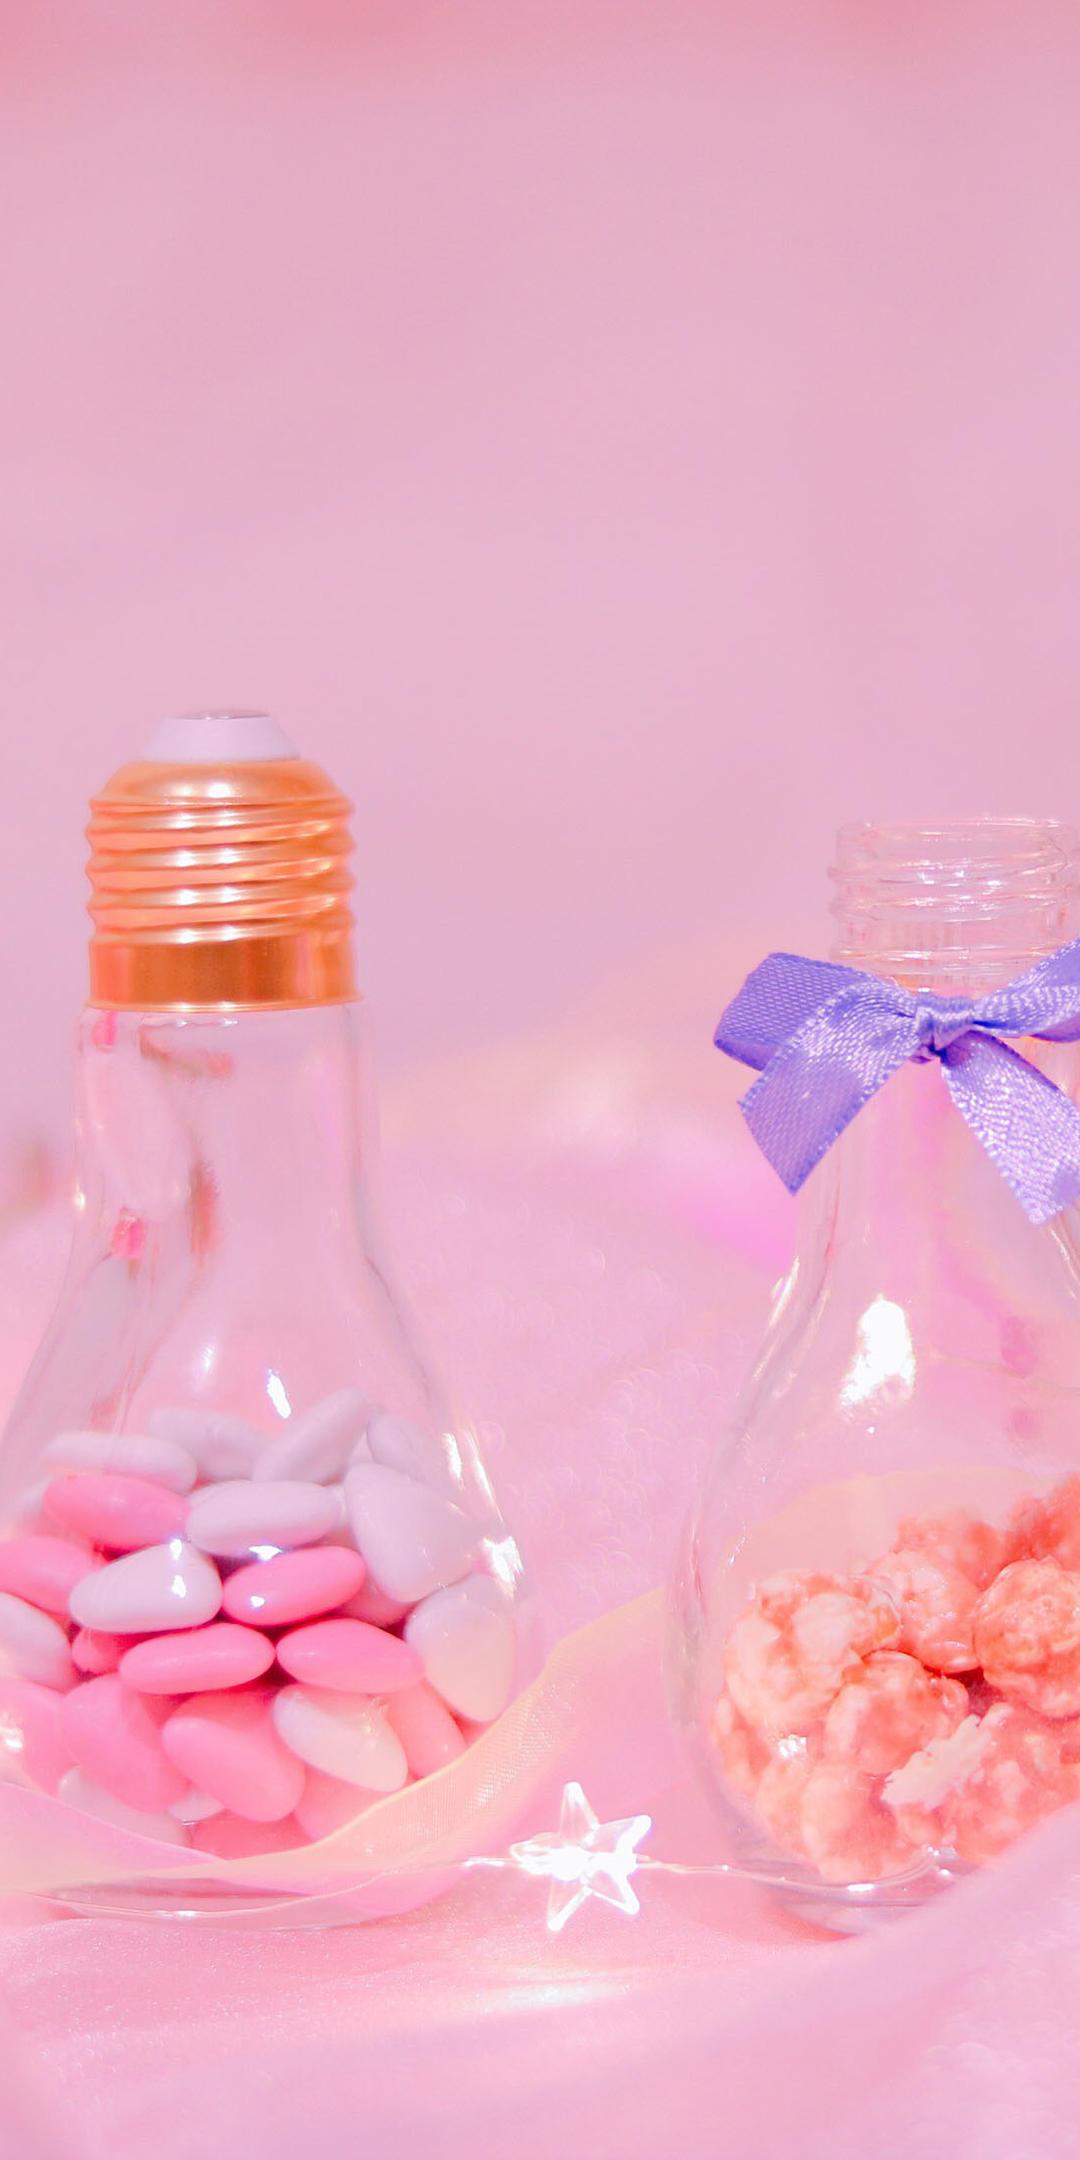 5e67b8a2537ef - 粉色系少女心手机壁纸